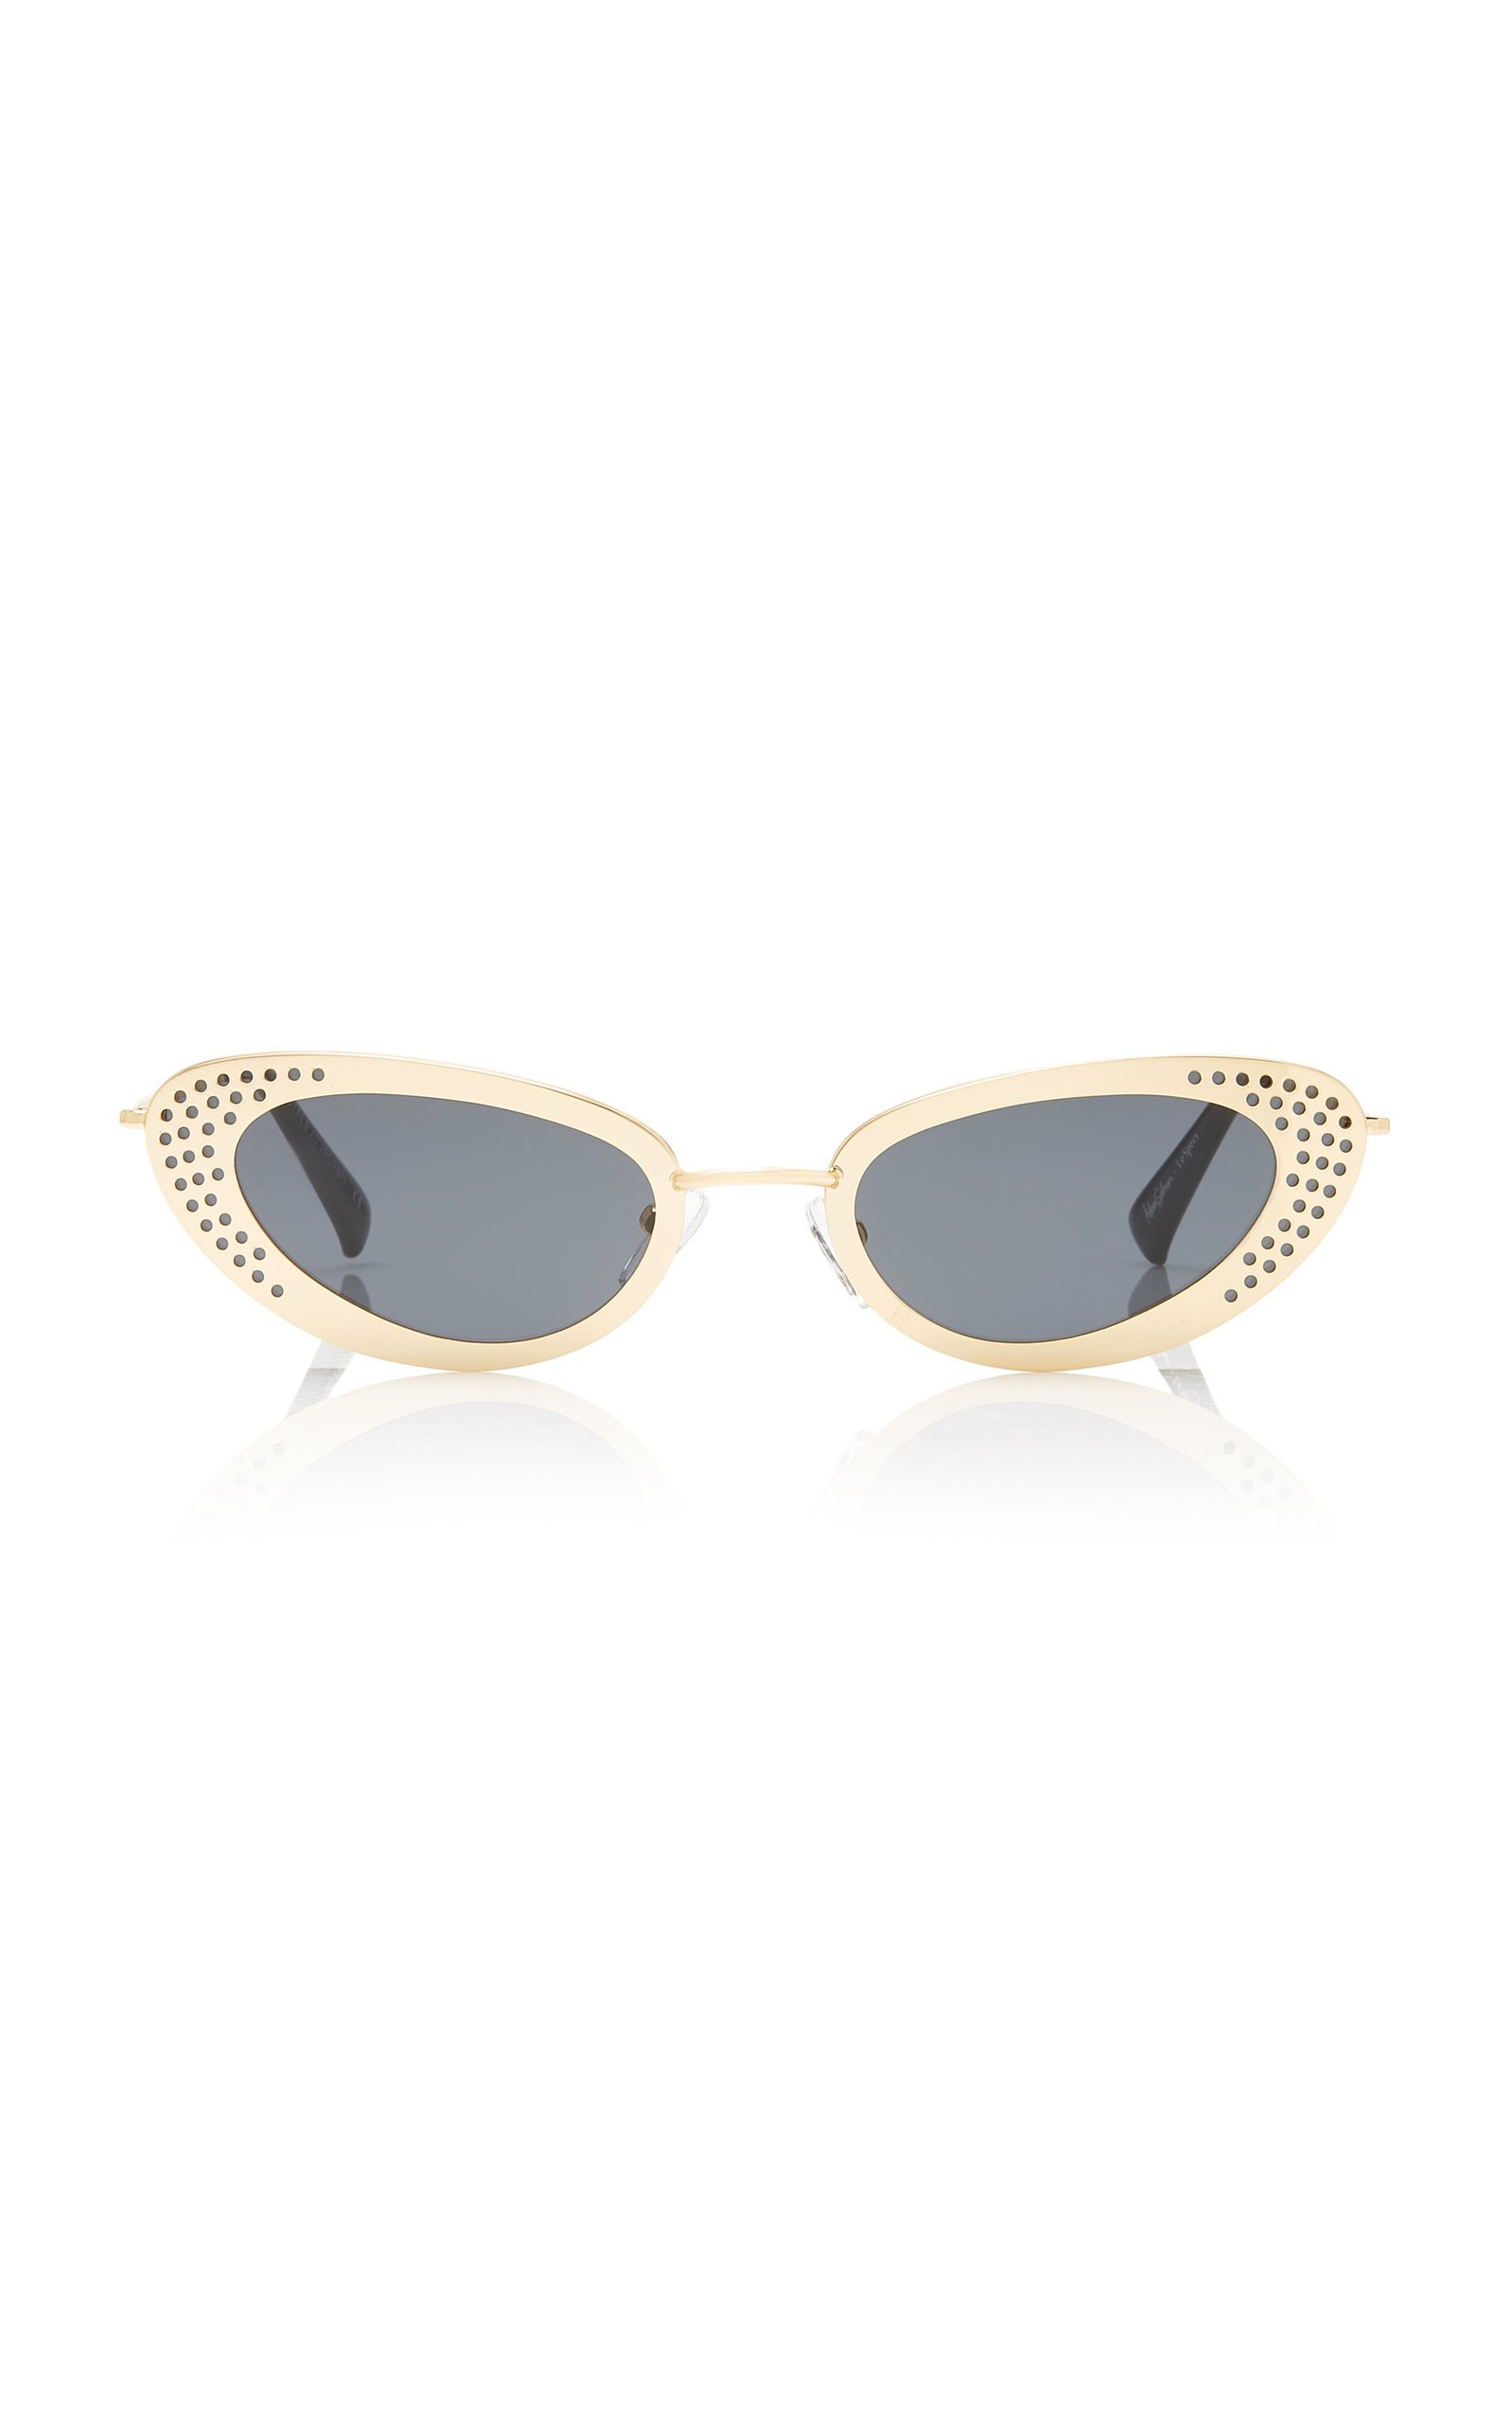 Adam Selman X Le Specs The Royale Metal Cat-Eye Sunglasses